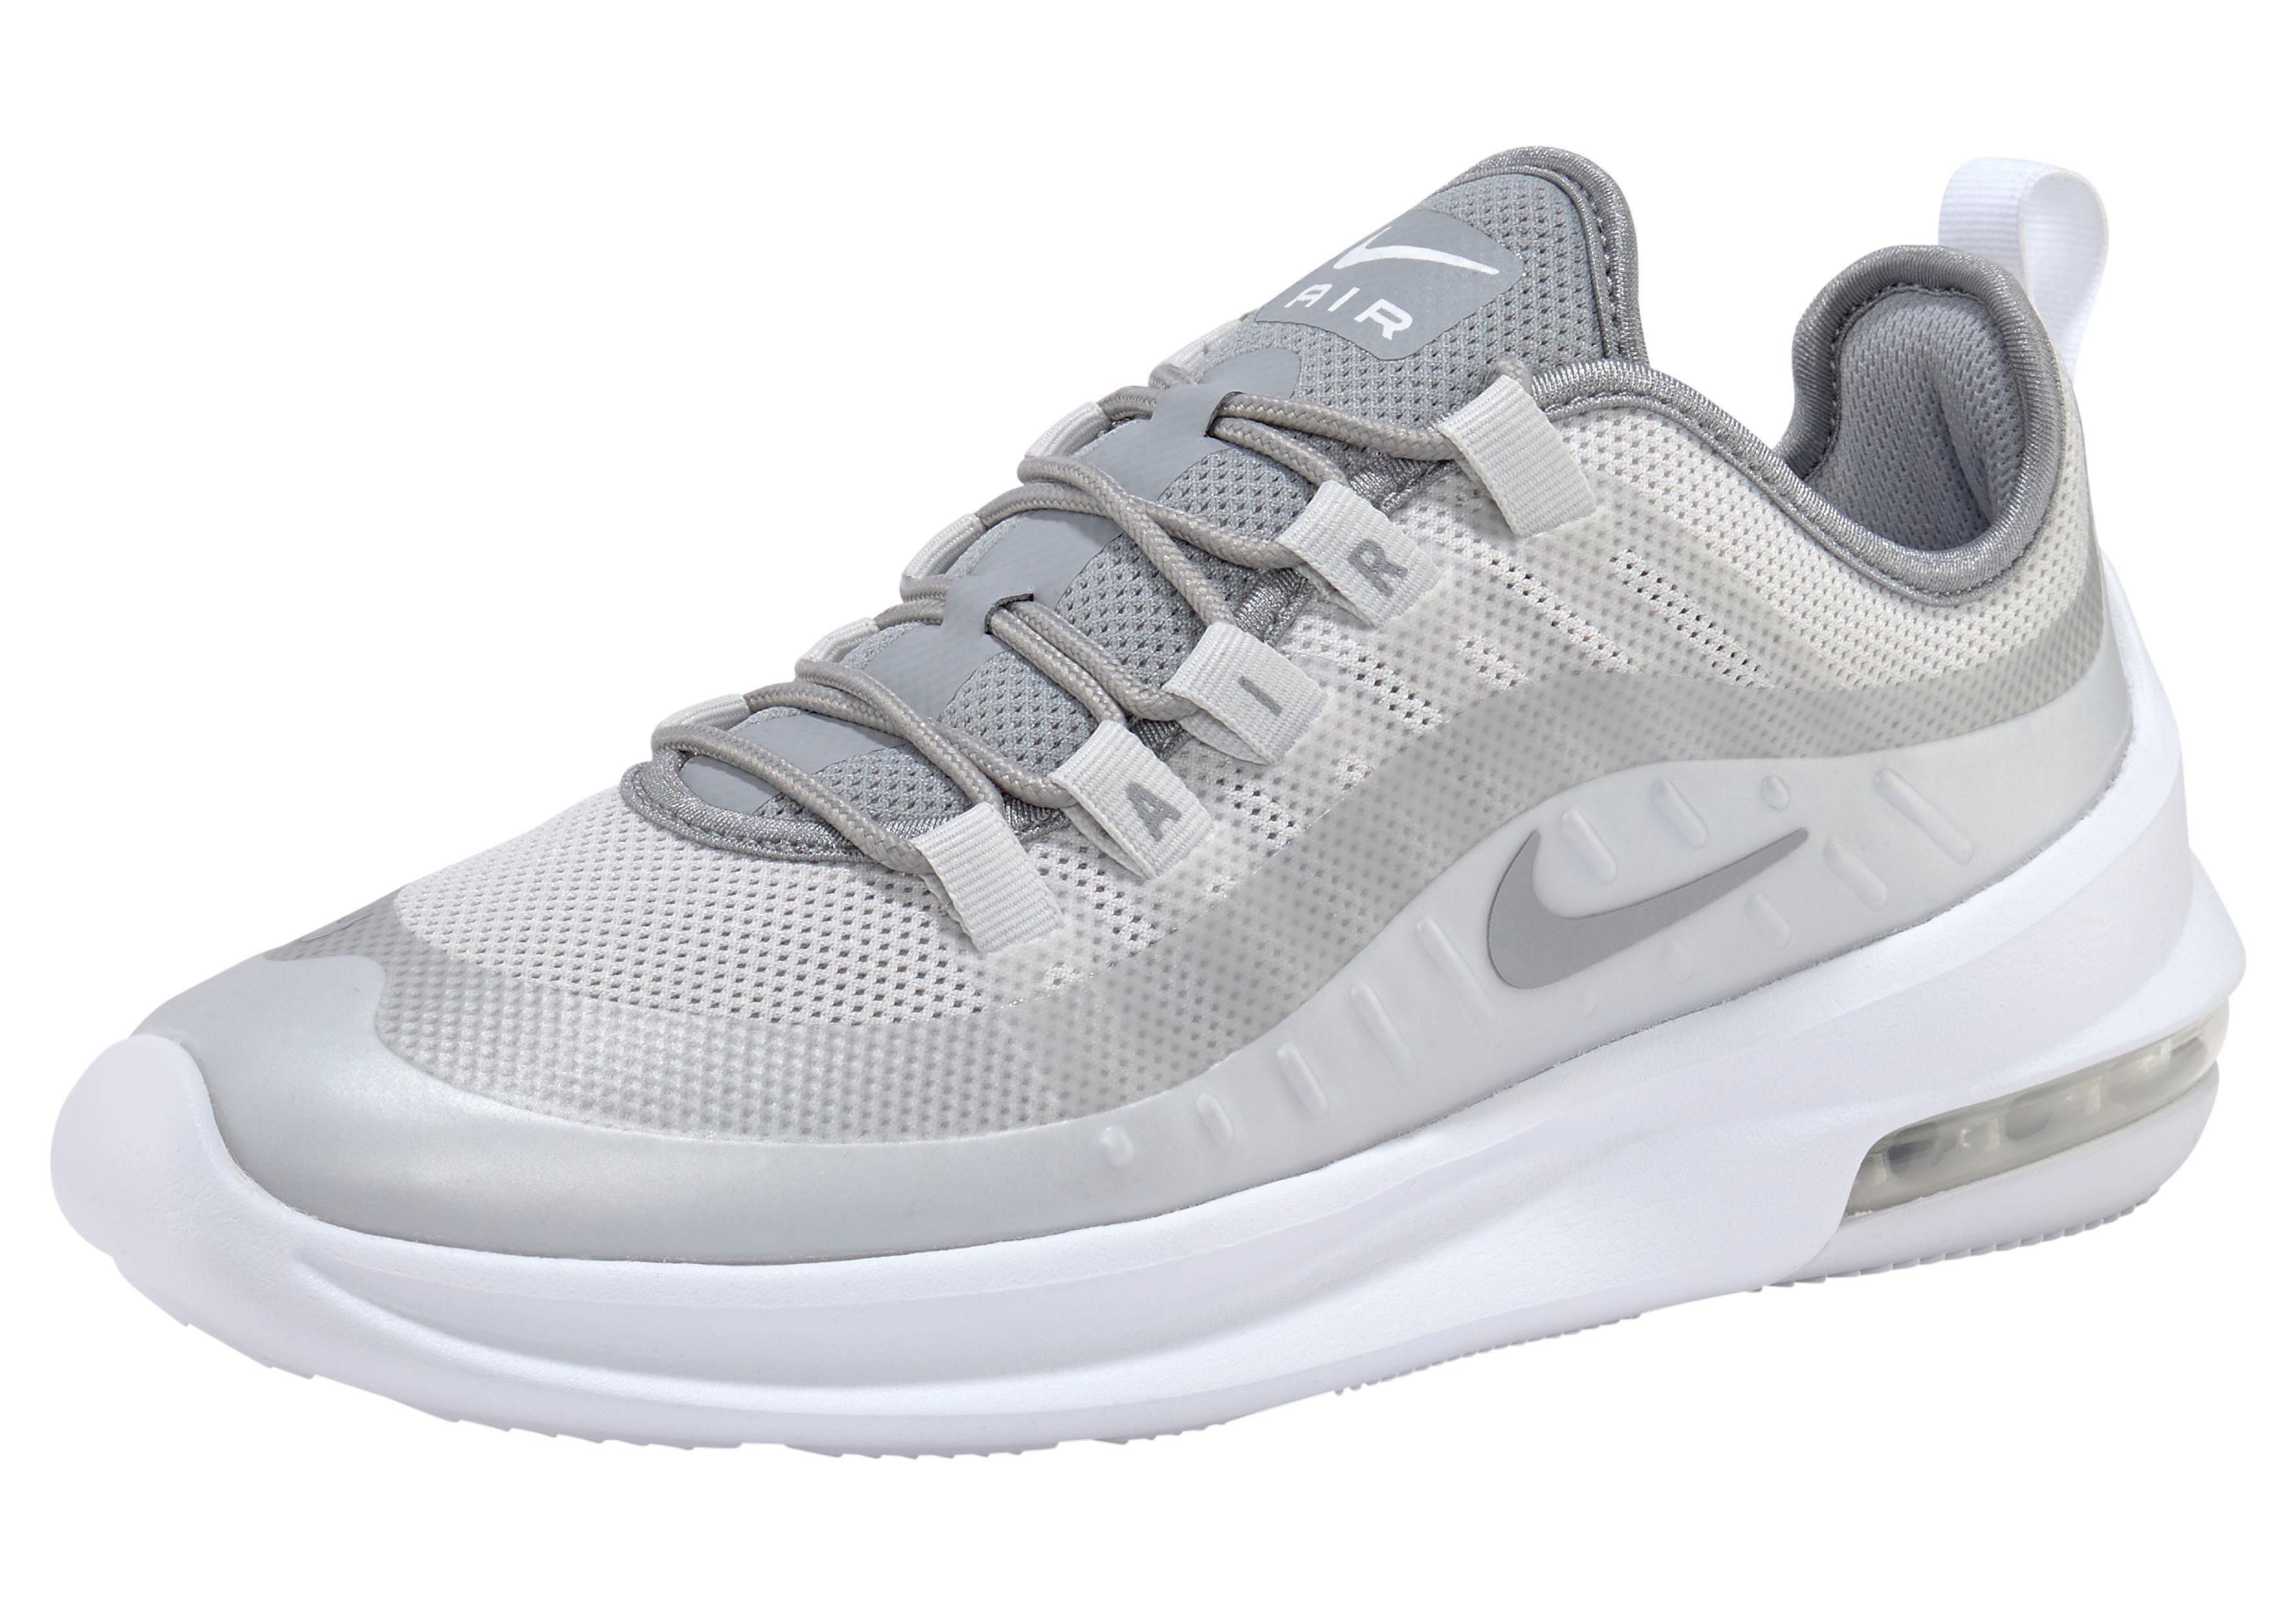 Nike Sportswear »Wmns Air Max Axis« Sneaker kaufen | OTTO